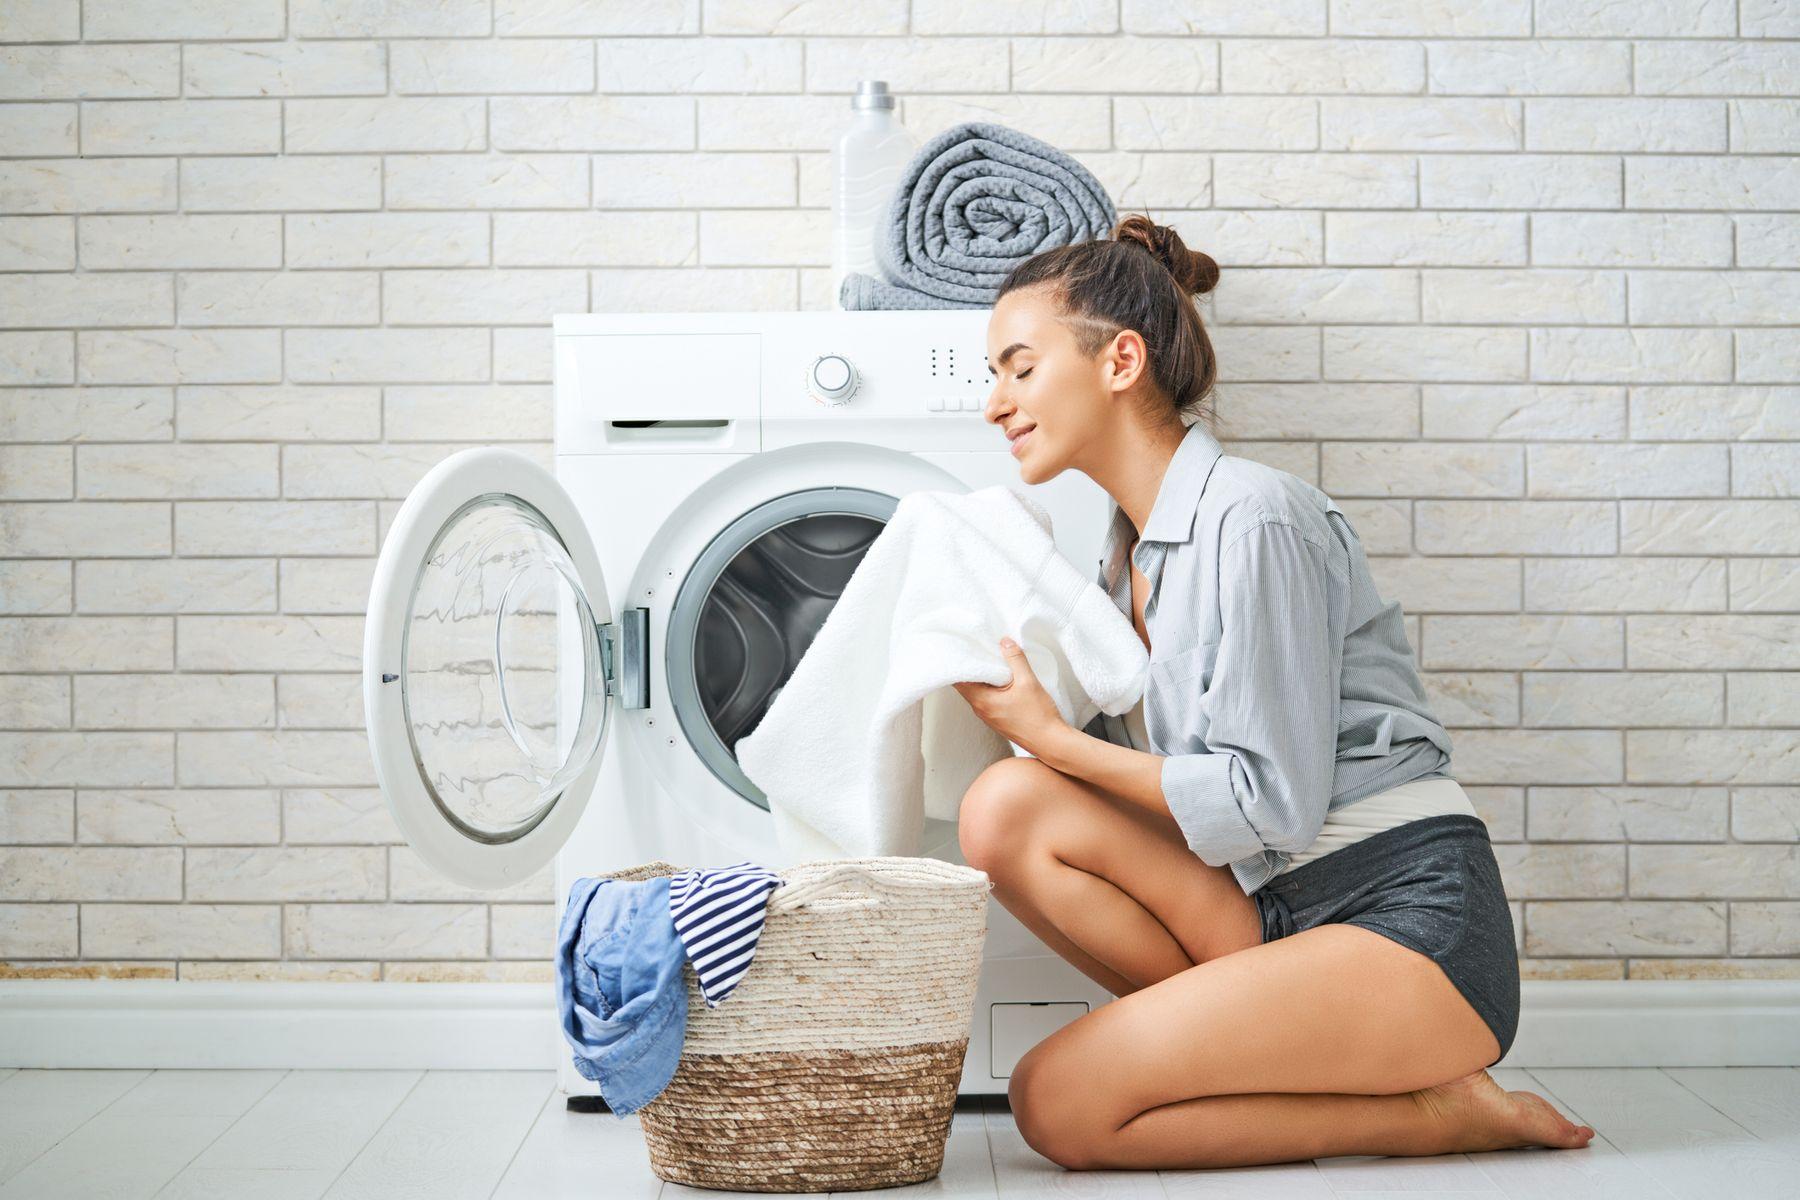 Kıyafet yıkama